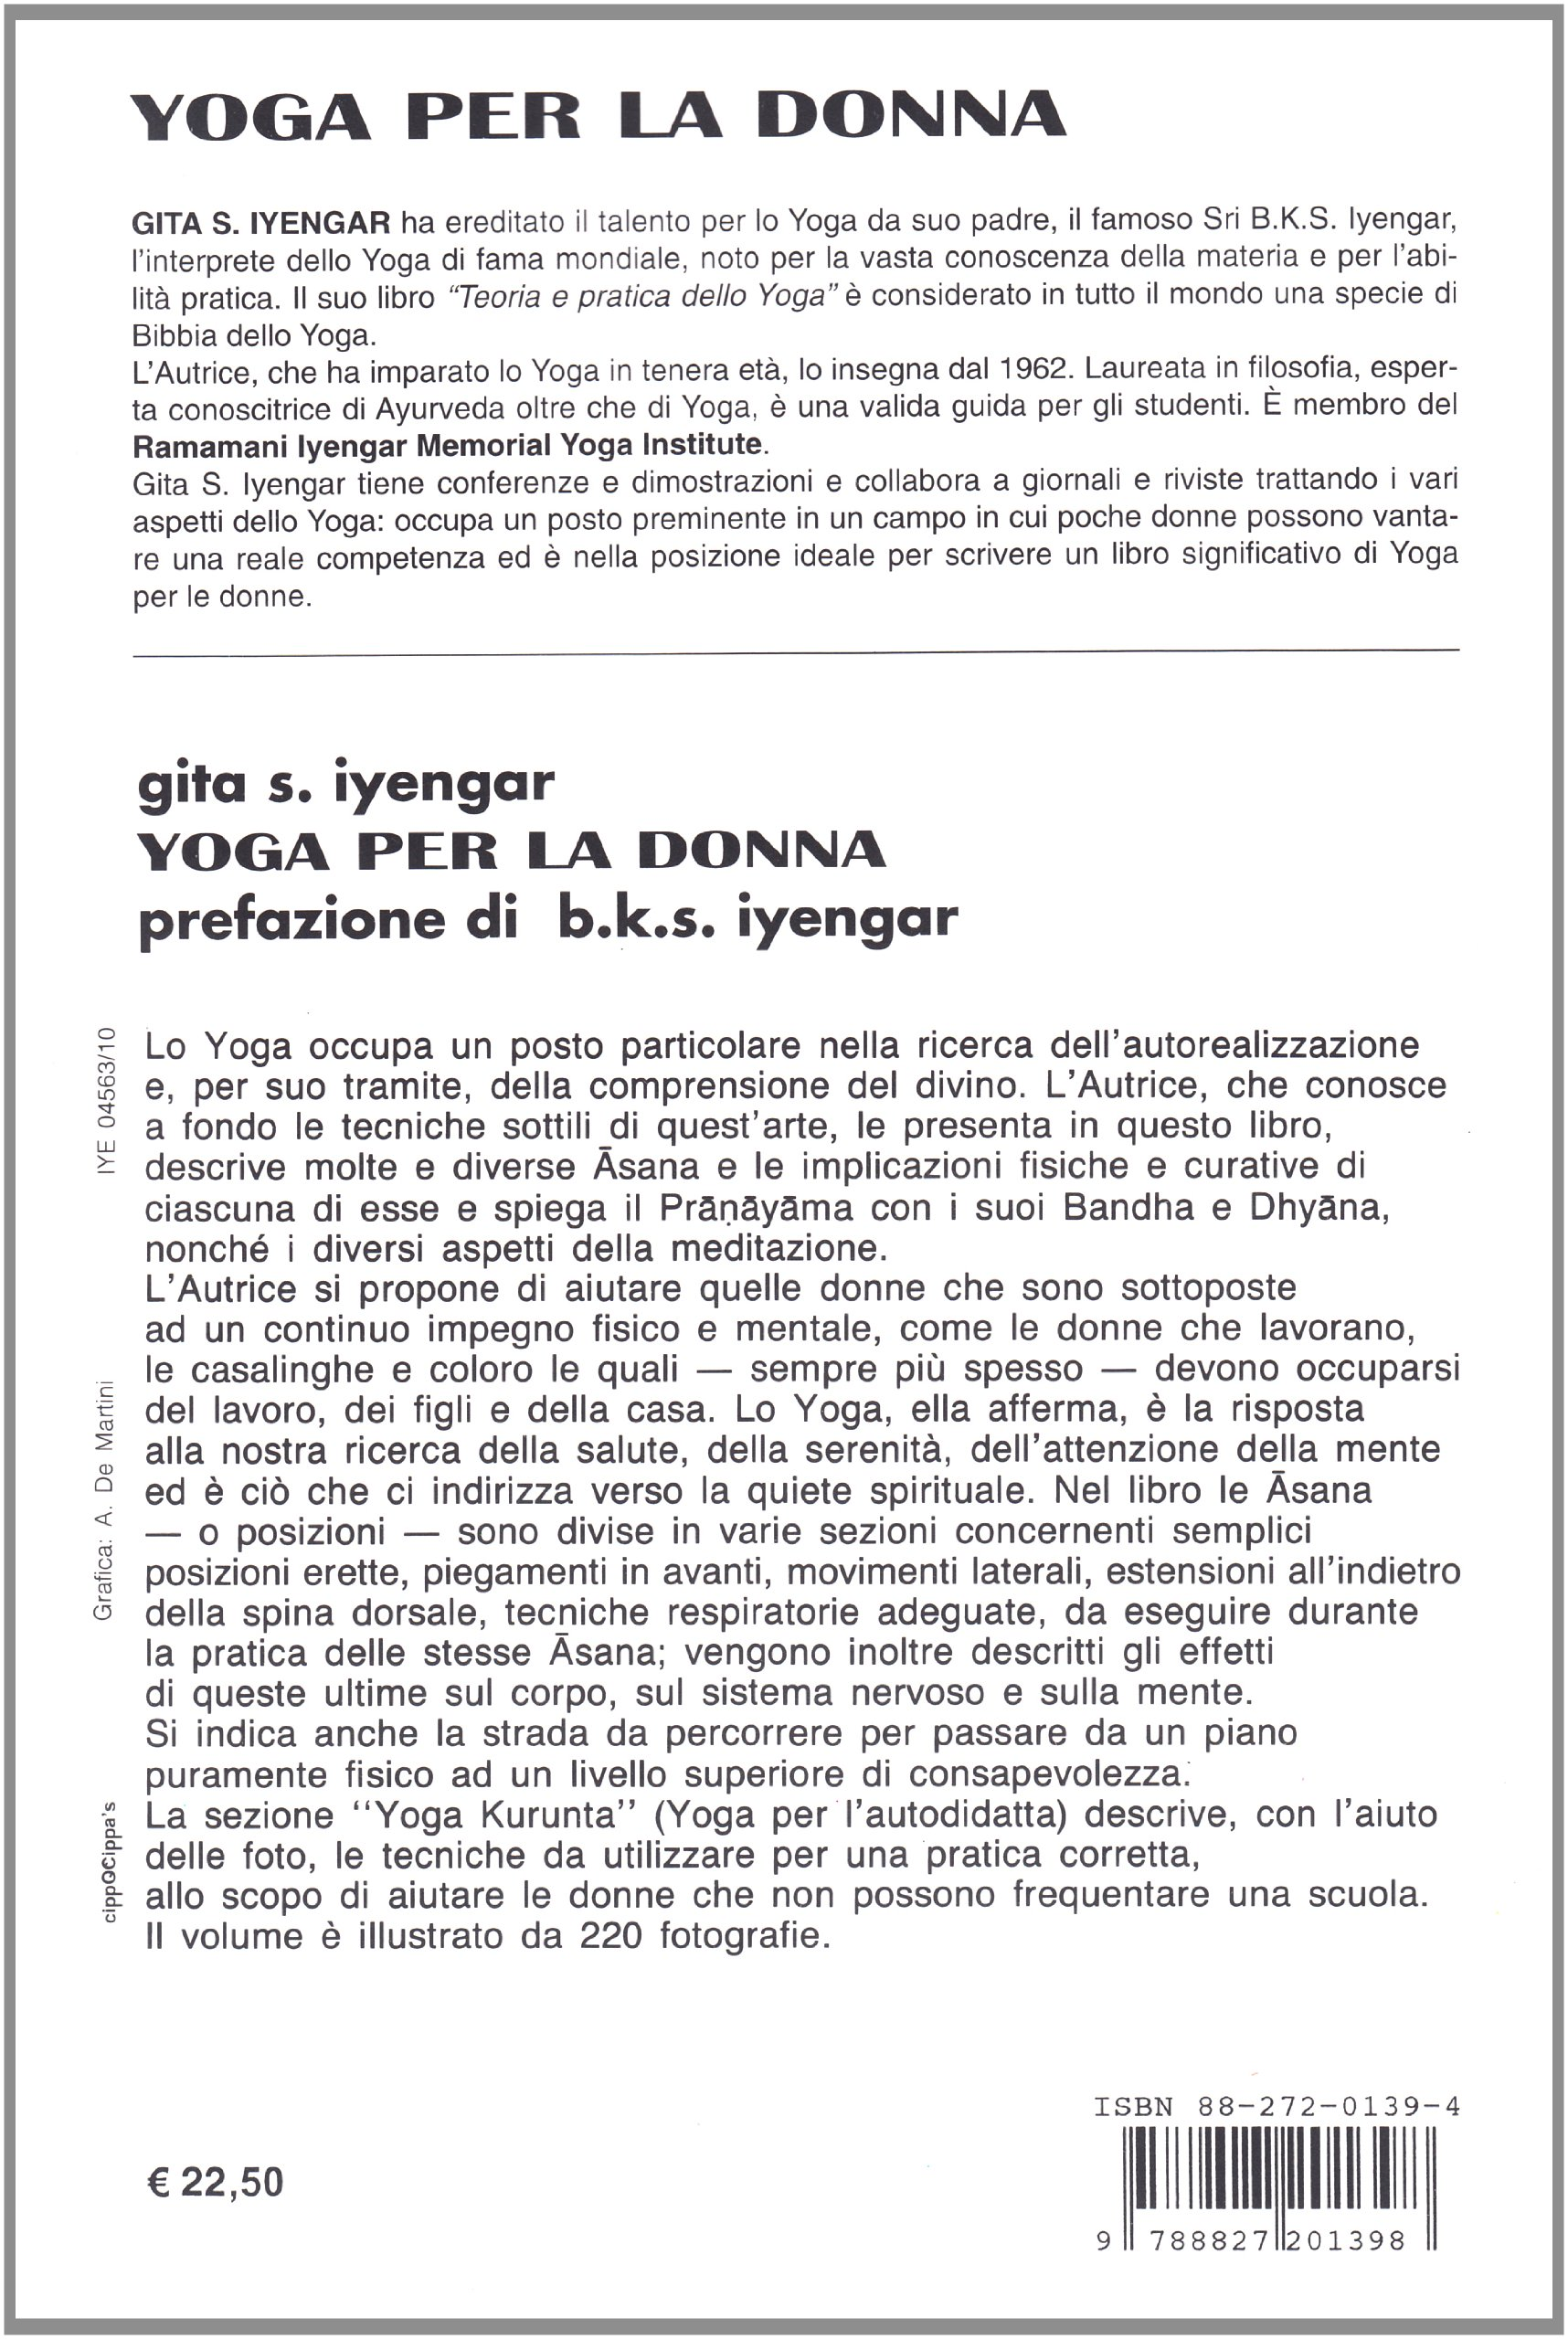 GITA IYENGAR - YOGA PER LA DO: Geeta S. Iyengar ...